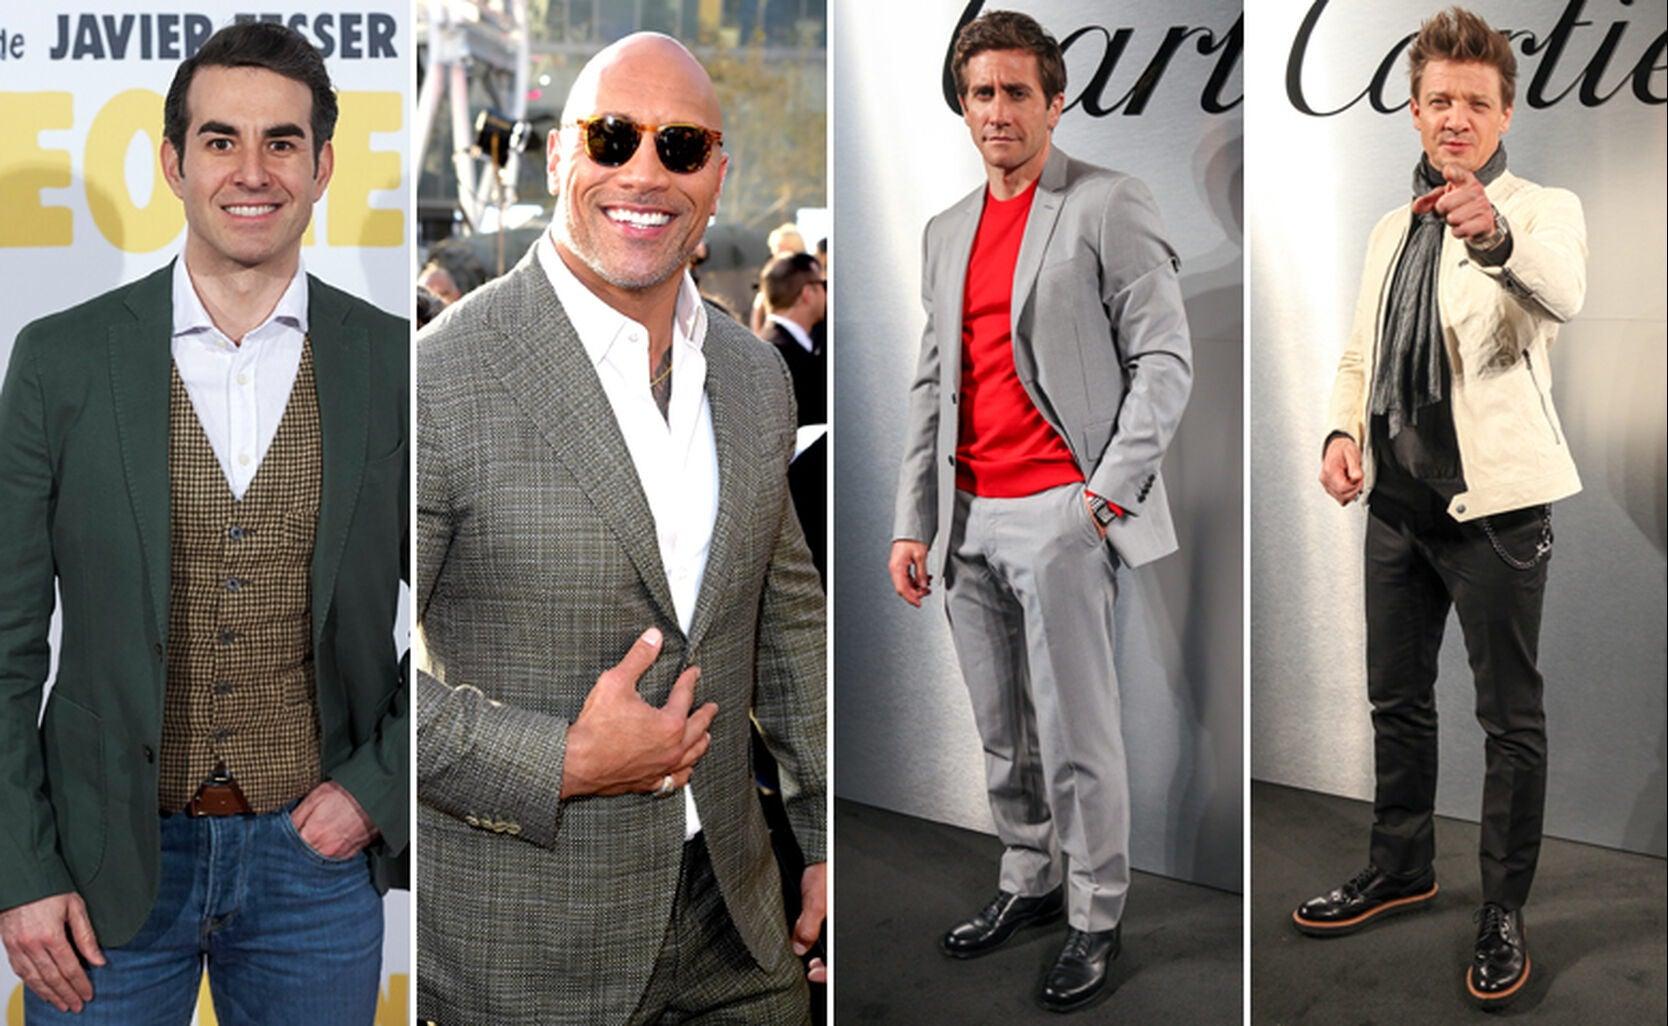 Daniel Muriel, Dwayne Johnson, Jake Gyllenhaal and Jeremy Renner